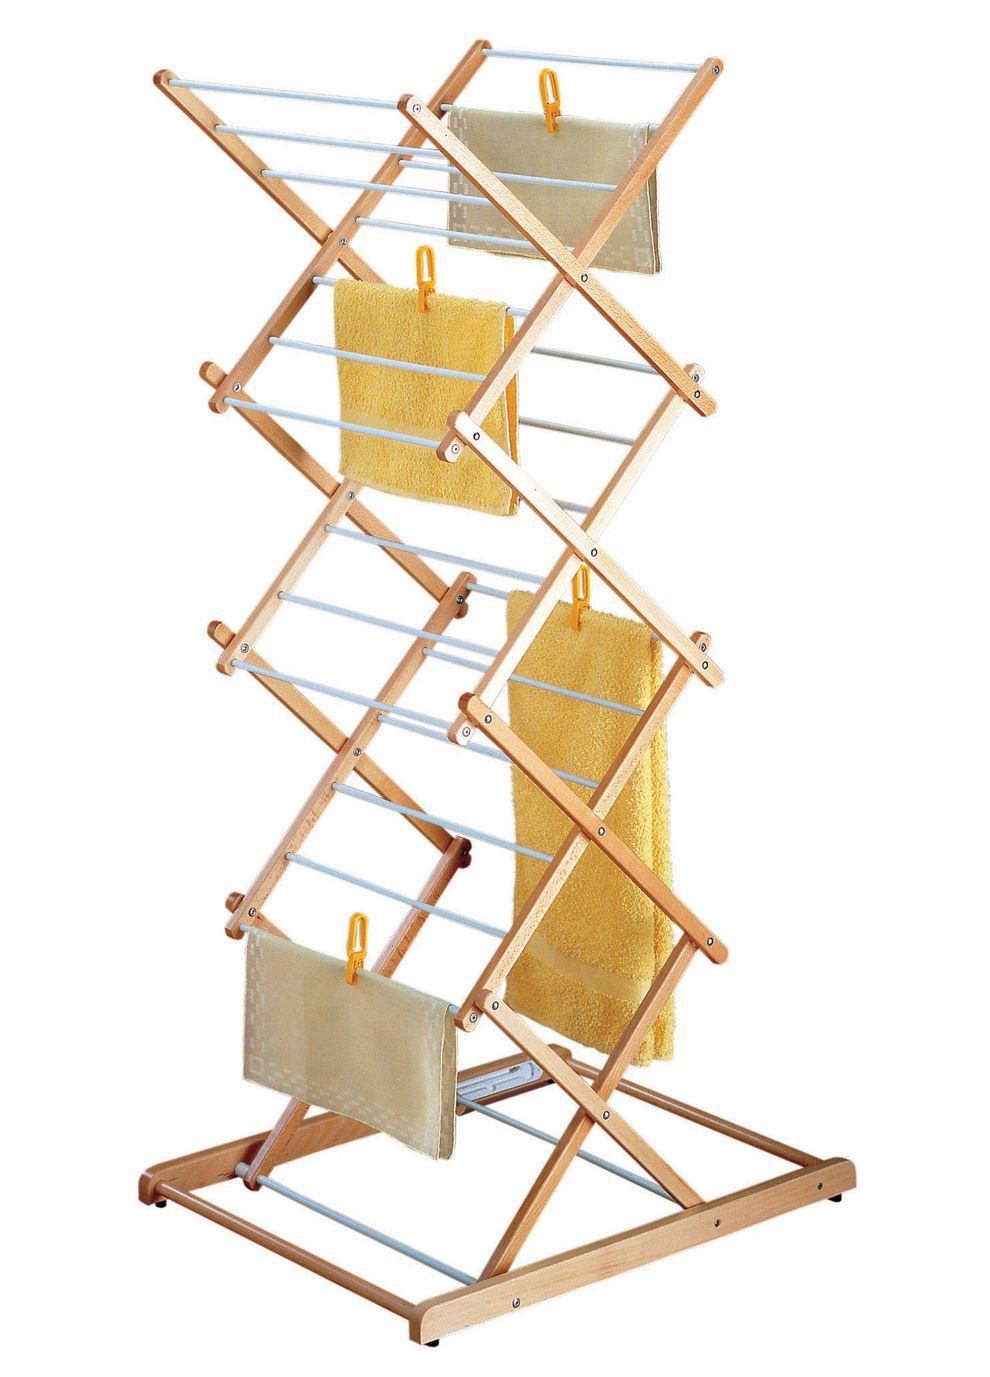 etendoir vertical new appartment must organize. Black Bedroom Furniture Sets. Home Design Ideas